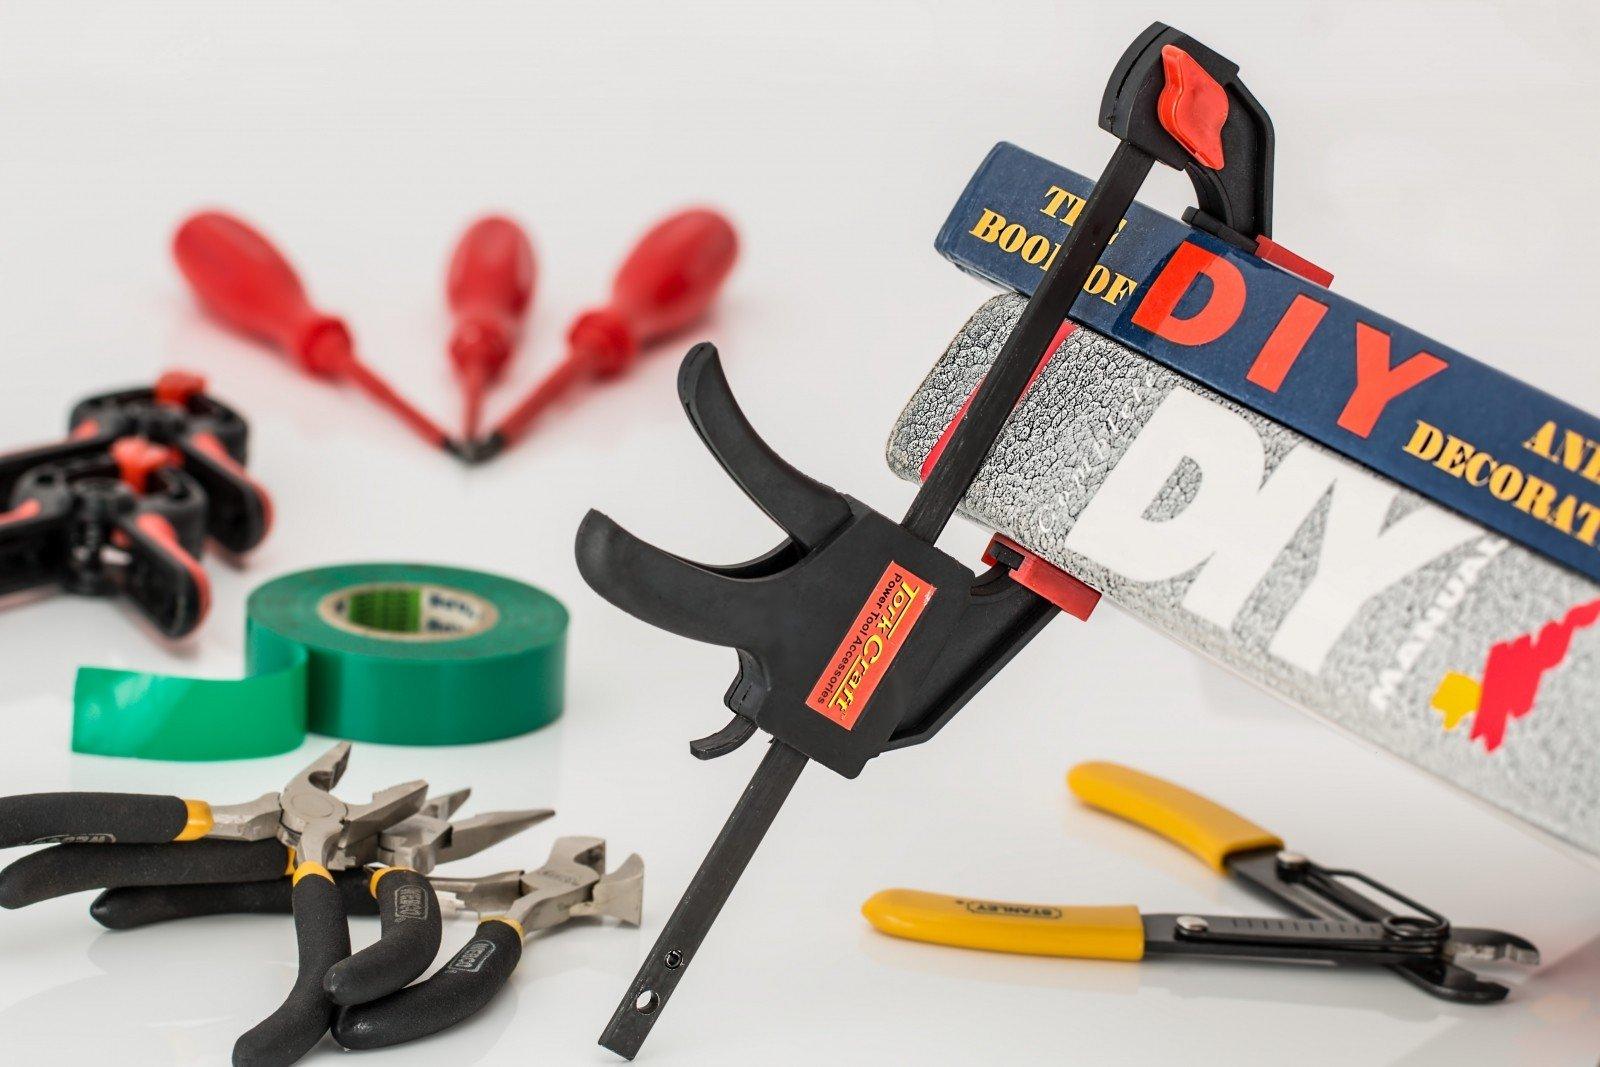 diy-do-it-yourself-repairs-home-improvement-hobby